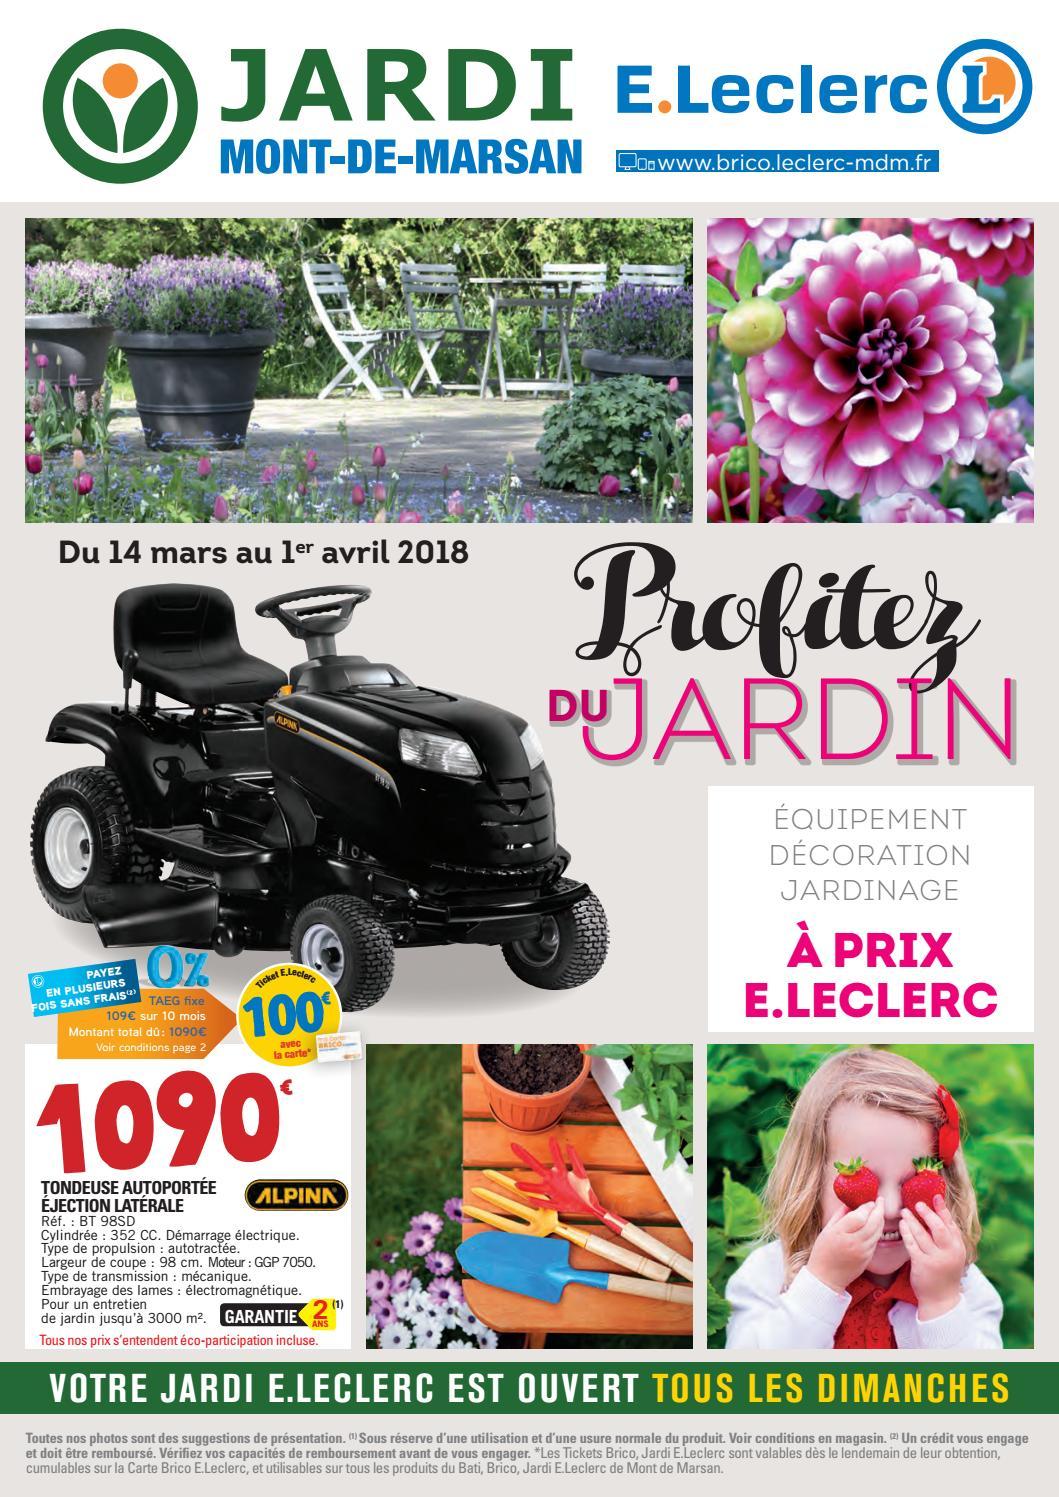 Catalogue Jardin - Jardi E.leclerc By Chou Magazine - Issuu avec Mini Serre Leclerc